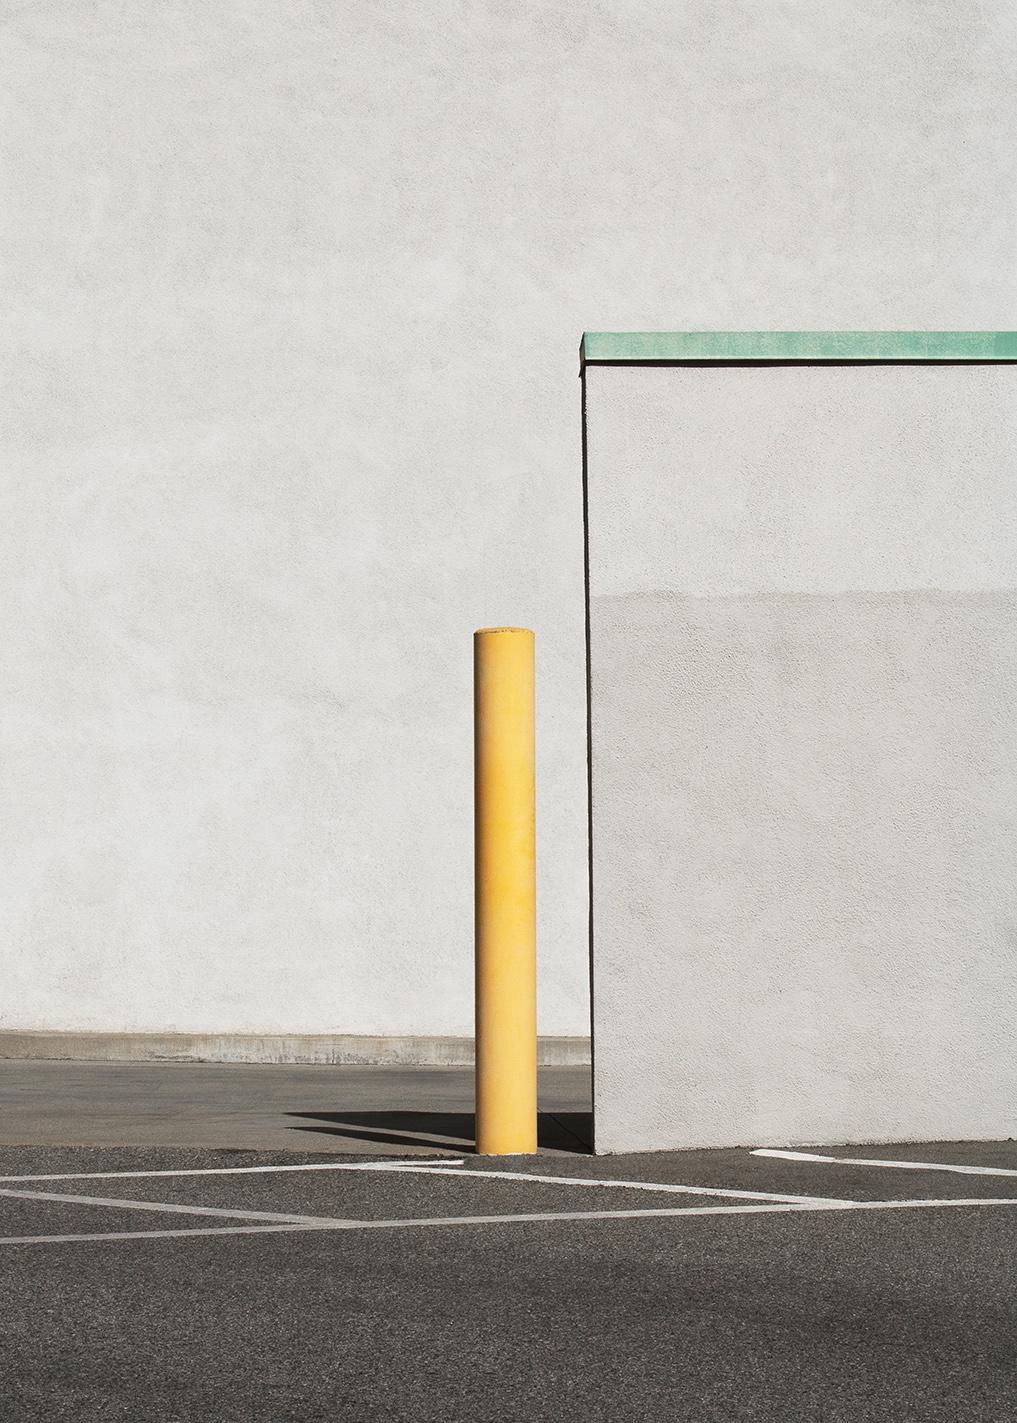 François Aubret | California 02